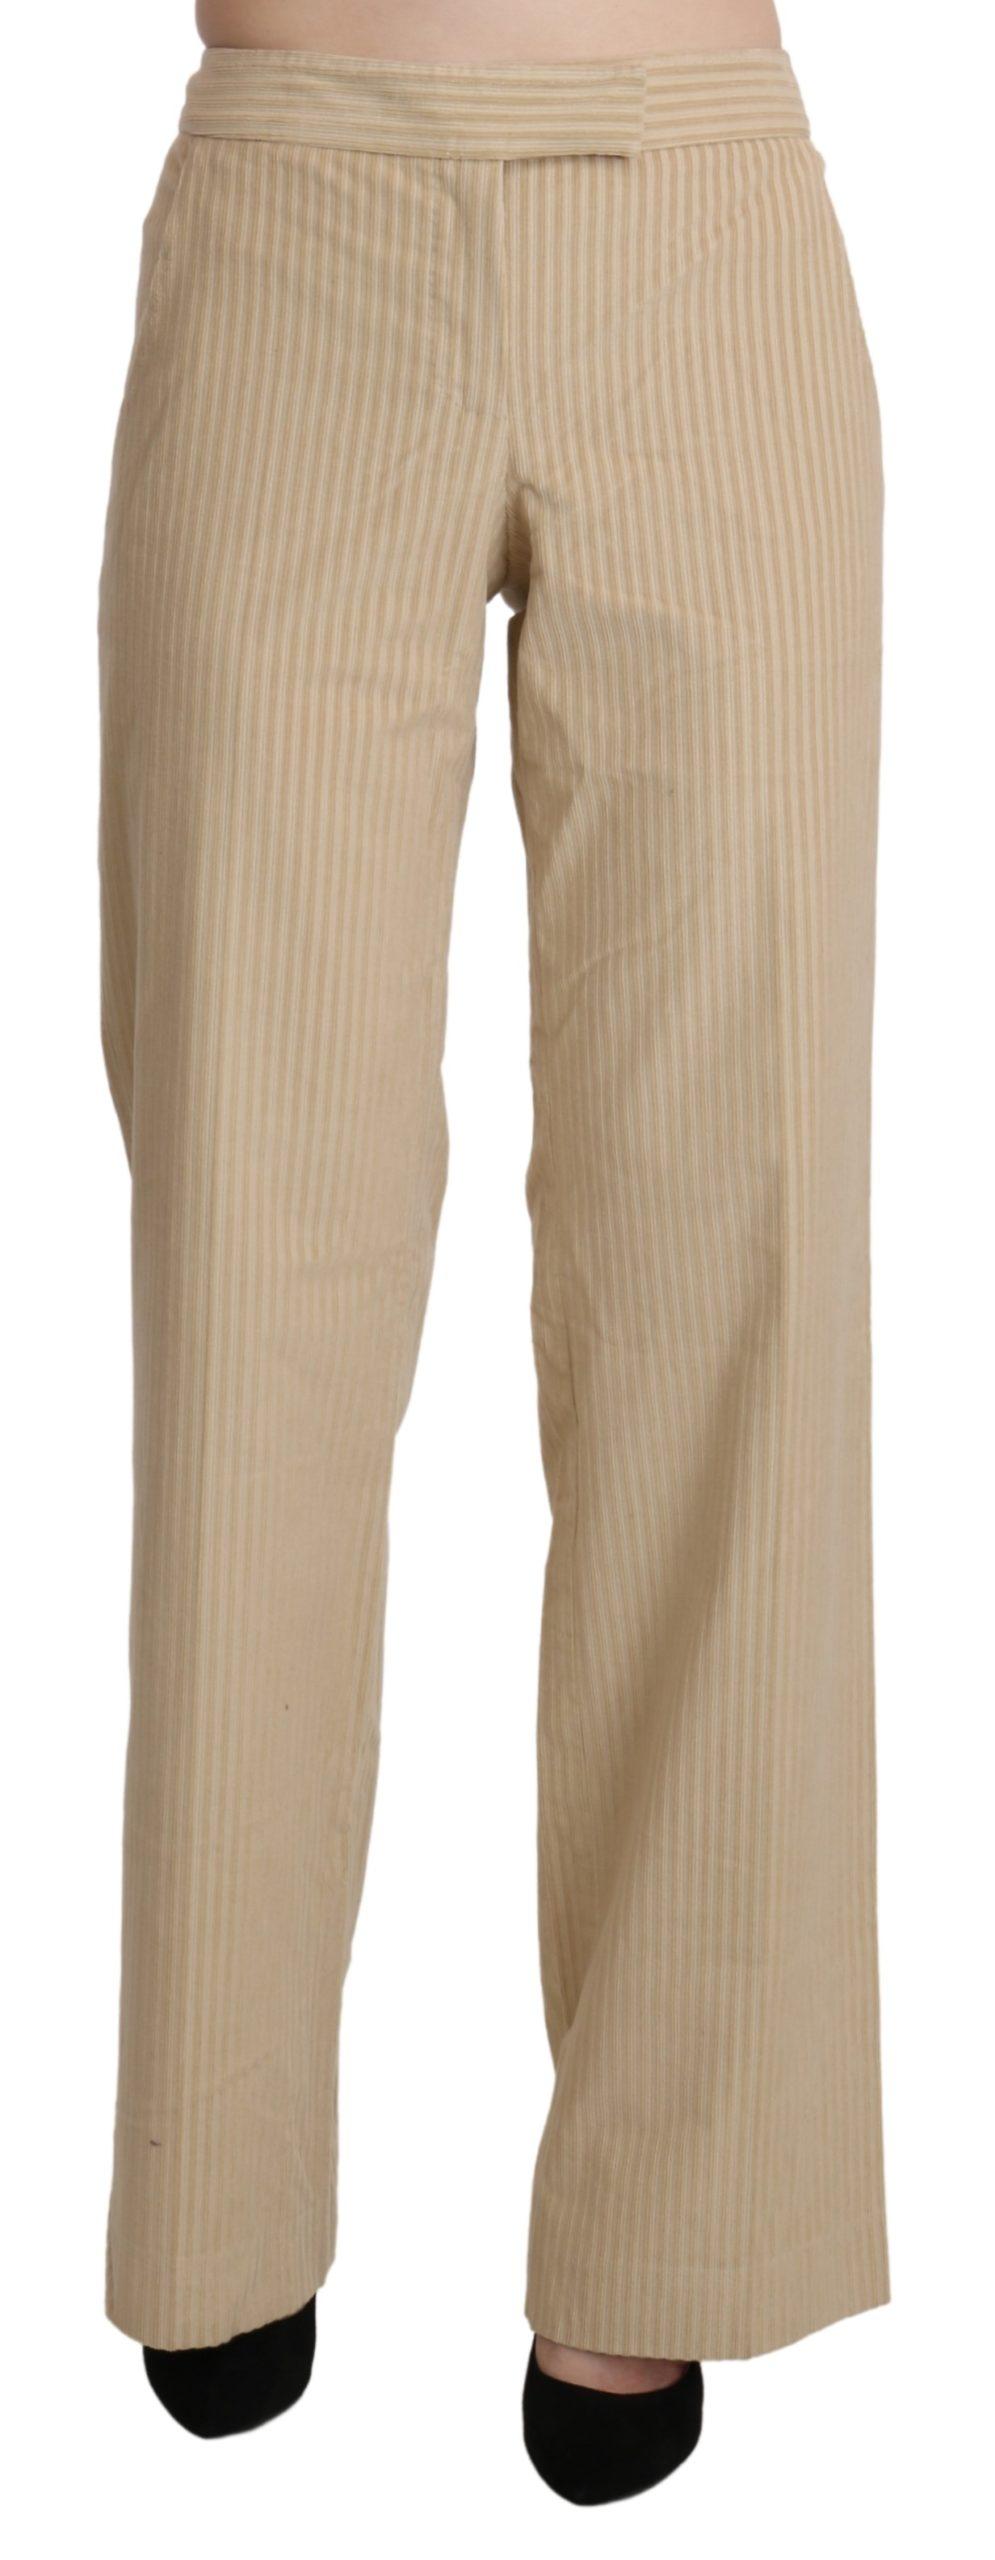 Beige High Waist Flared Wide Leg Trouser Pants - IT44 L